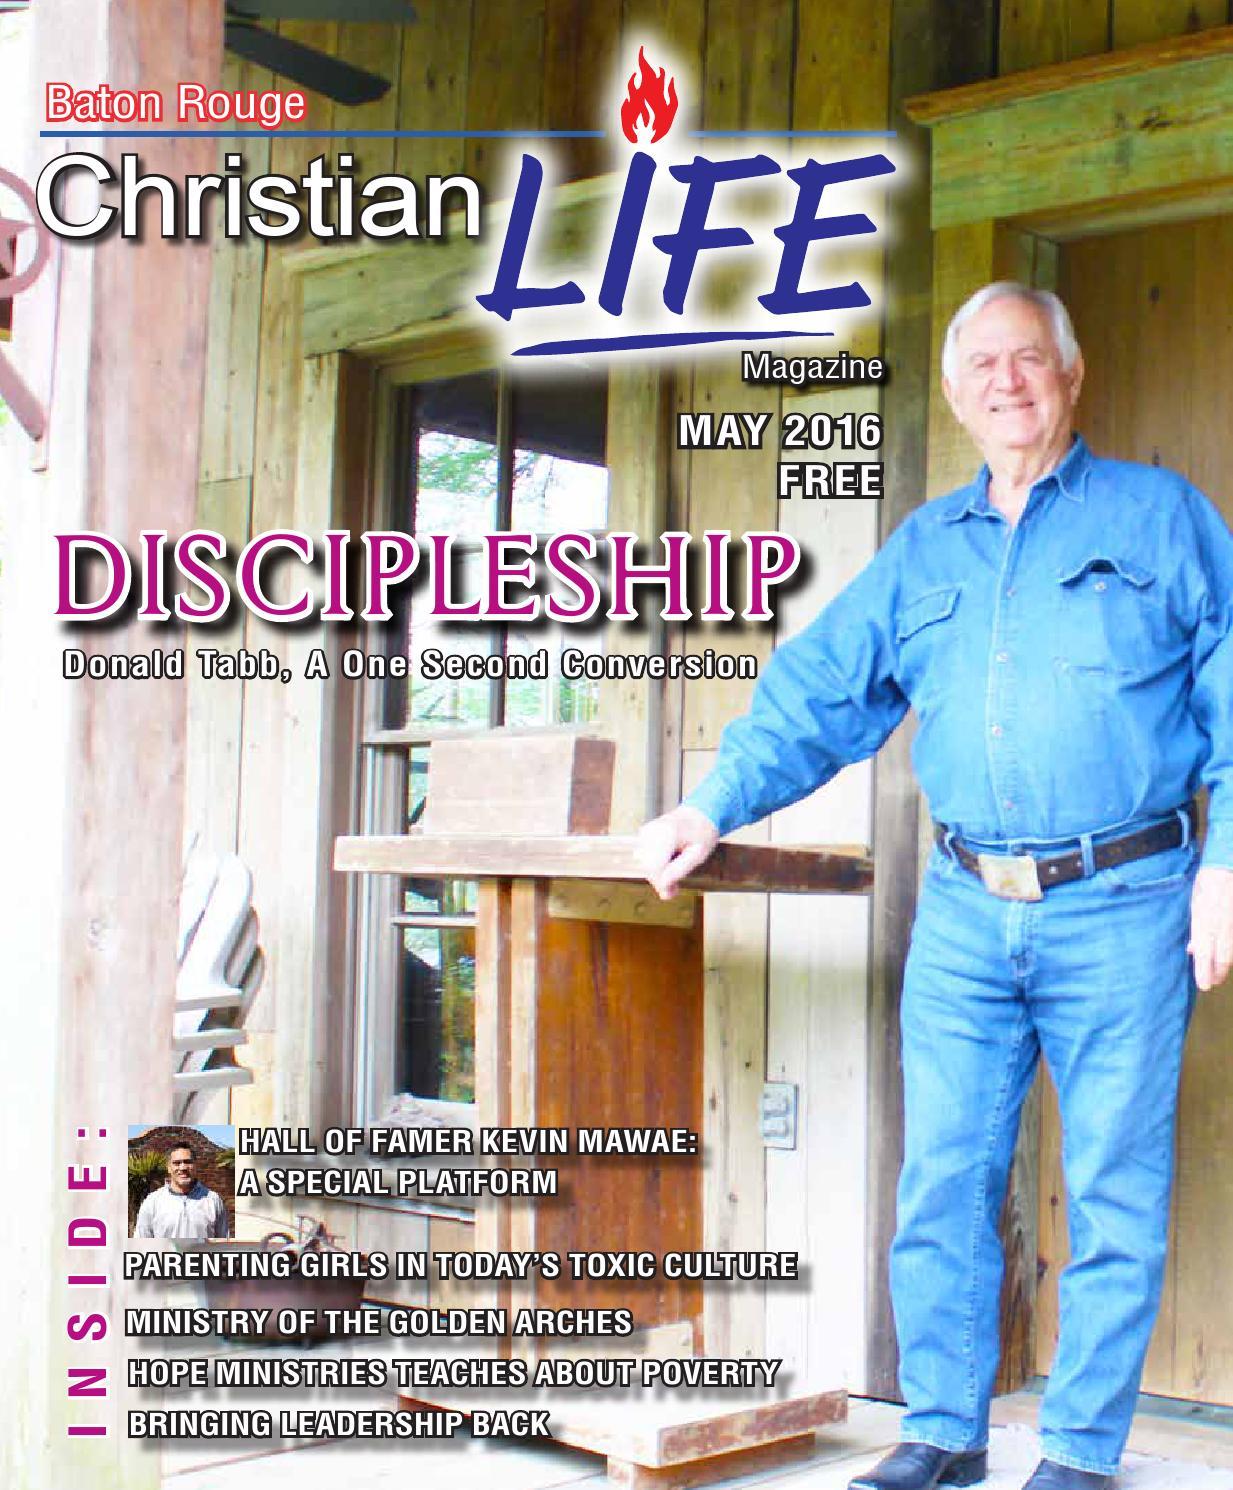 Baton Rouge Christian Life Magazine May 2016 Edition By